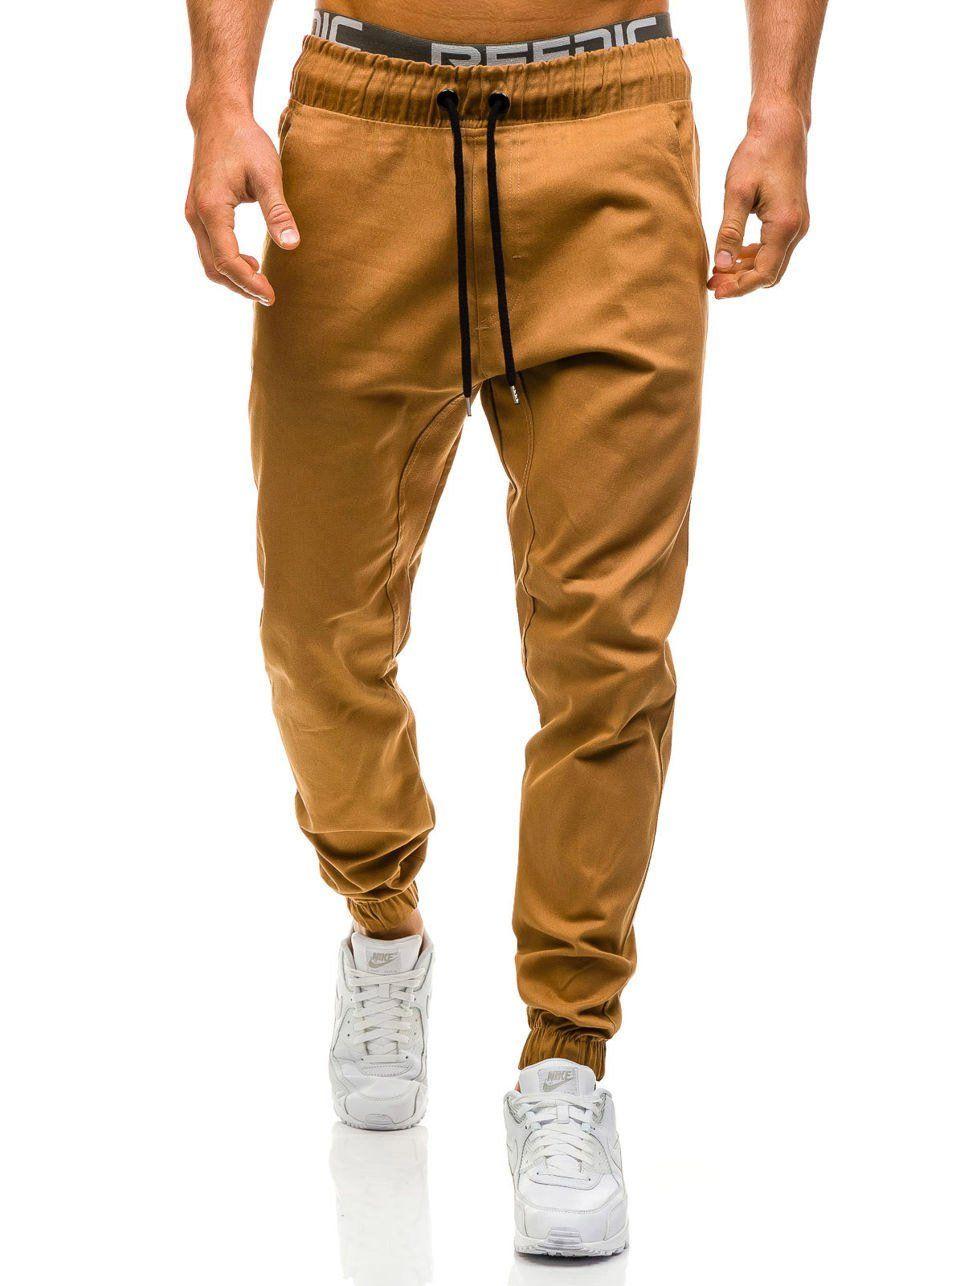 Men Joggers 2018 New Casual Pants Men Brand Clothing High Quality Spring  Long Khaki Pants Elastic Male Trousers 3XL NZ317 2921bde0dda